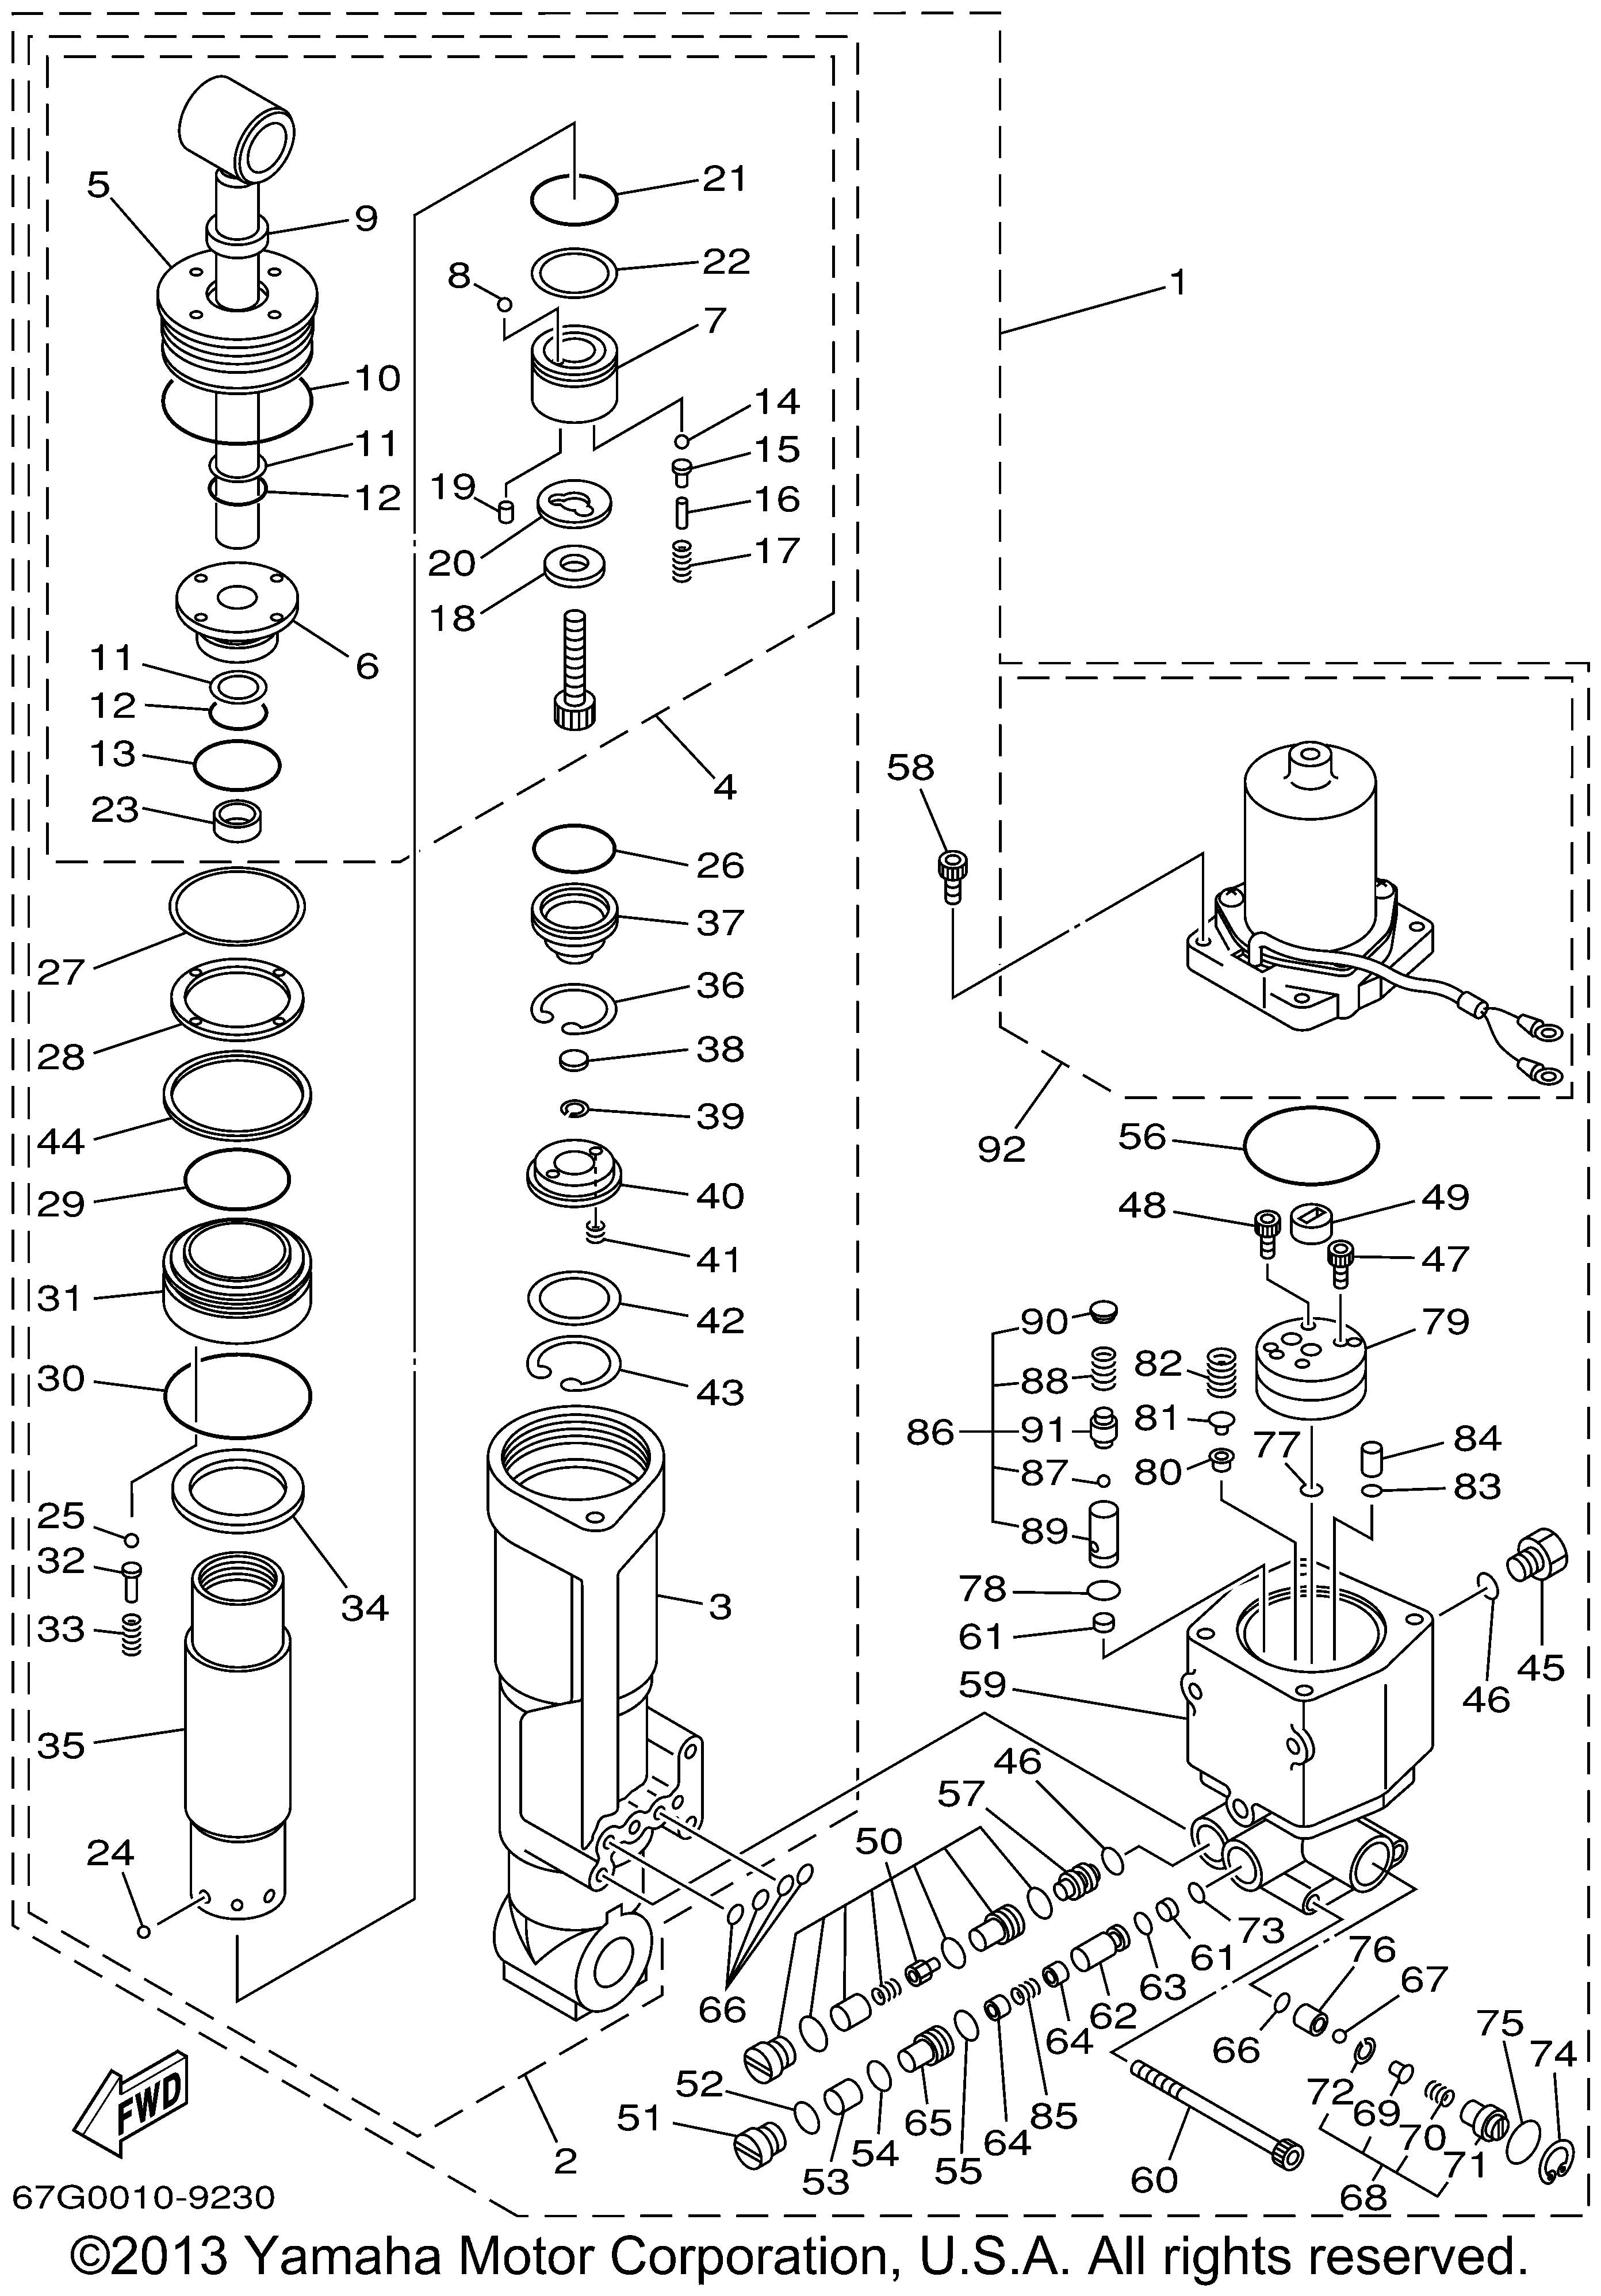 Yamaha OEM Part 67F-4380K-00-00 Power Trim Cylinder